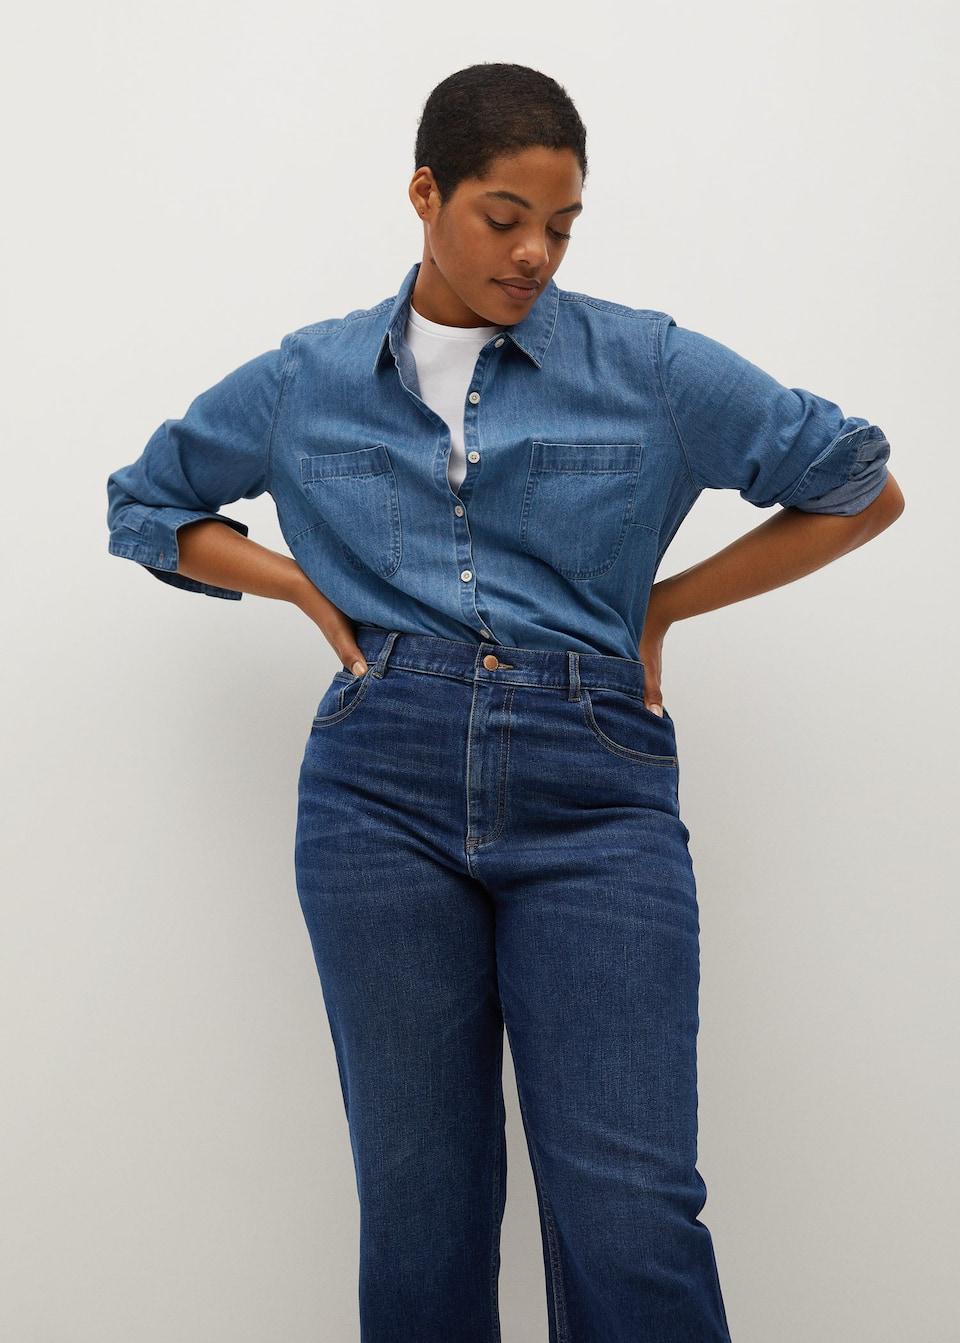 High Waist Straight Jeans Plus Sizes Violeta By Mango Aruba